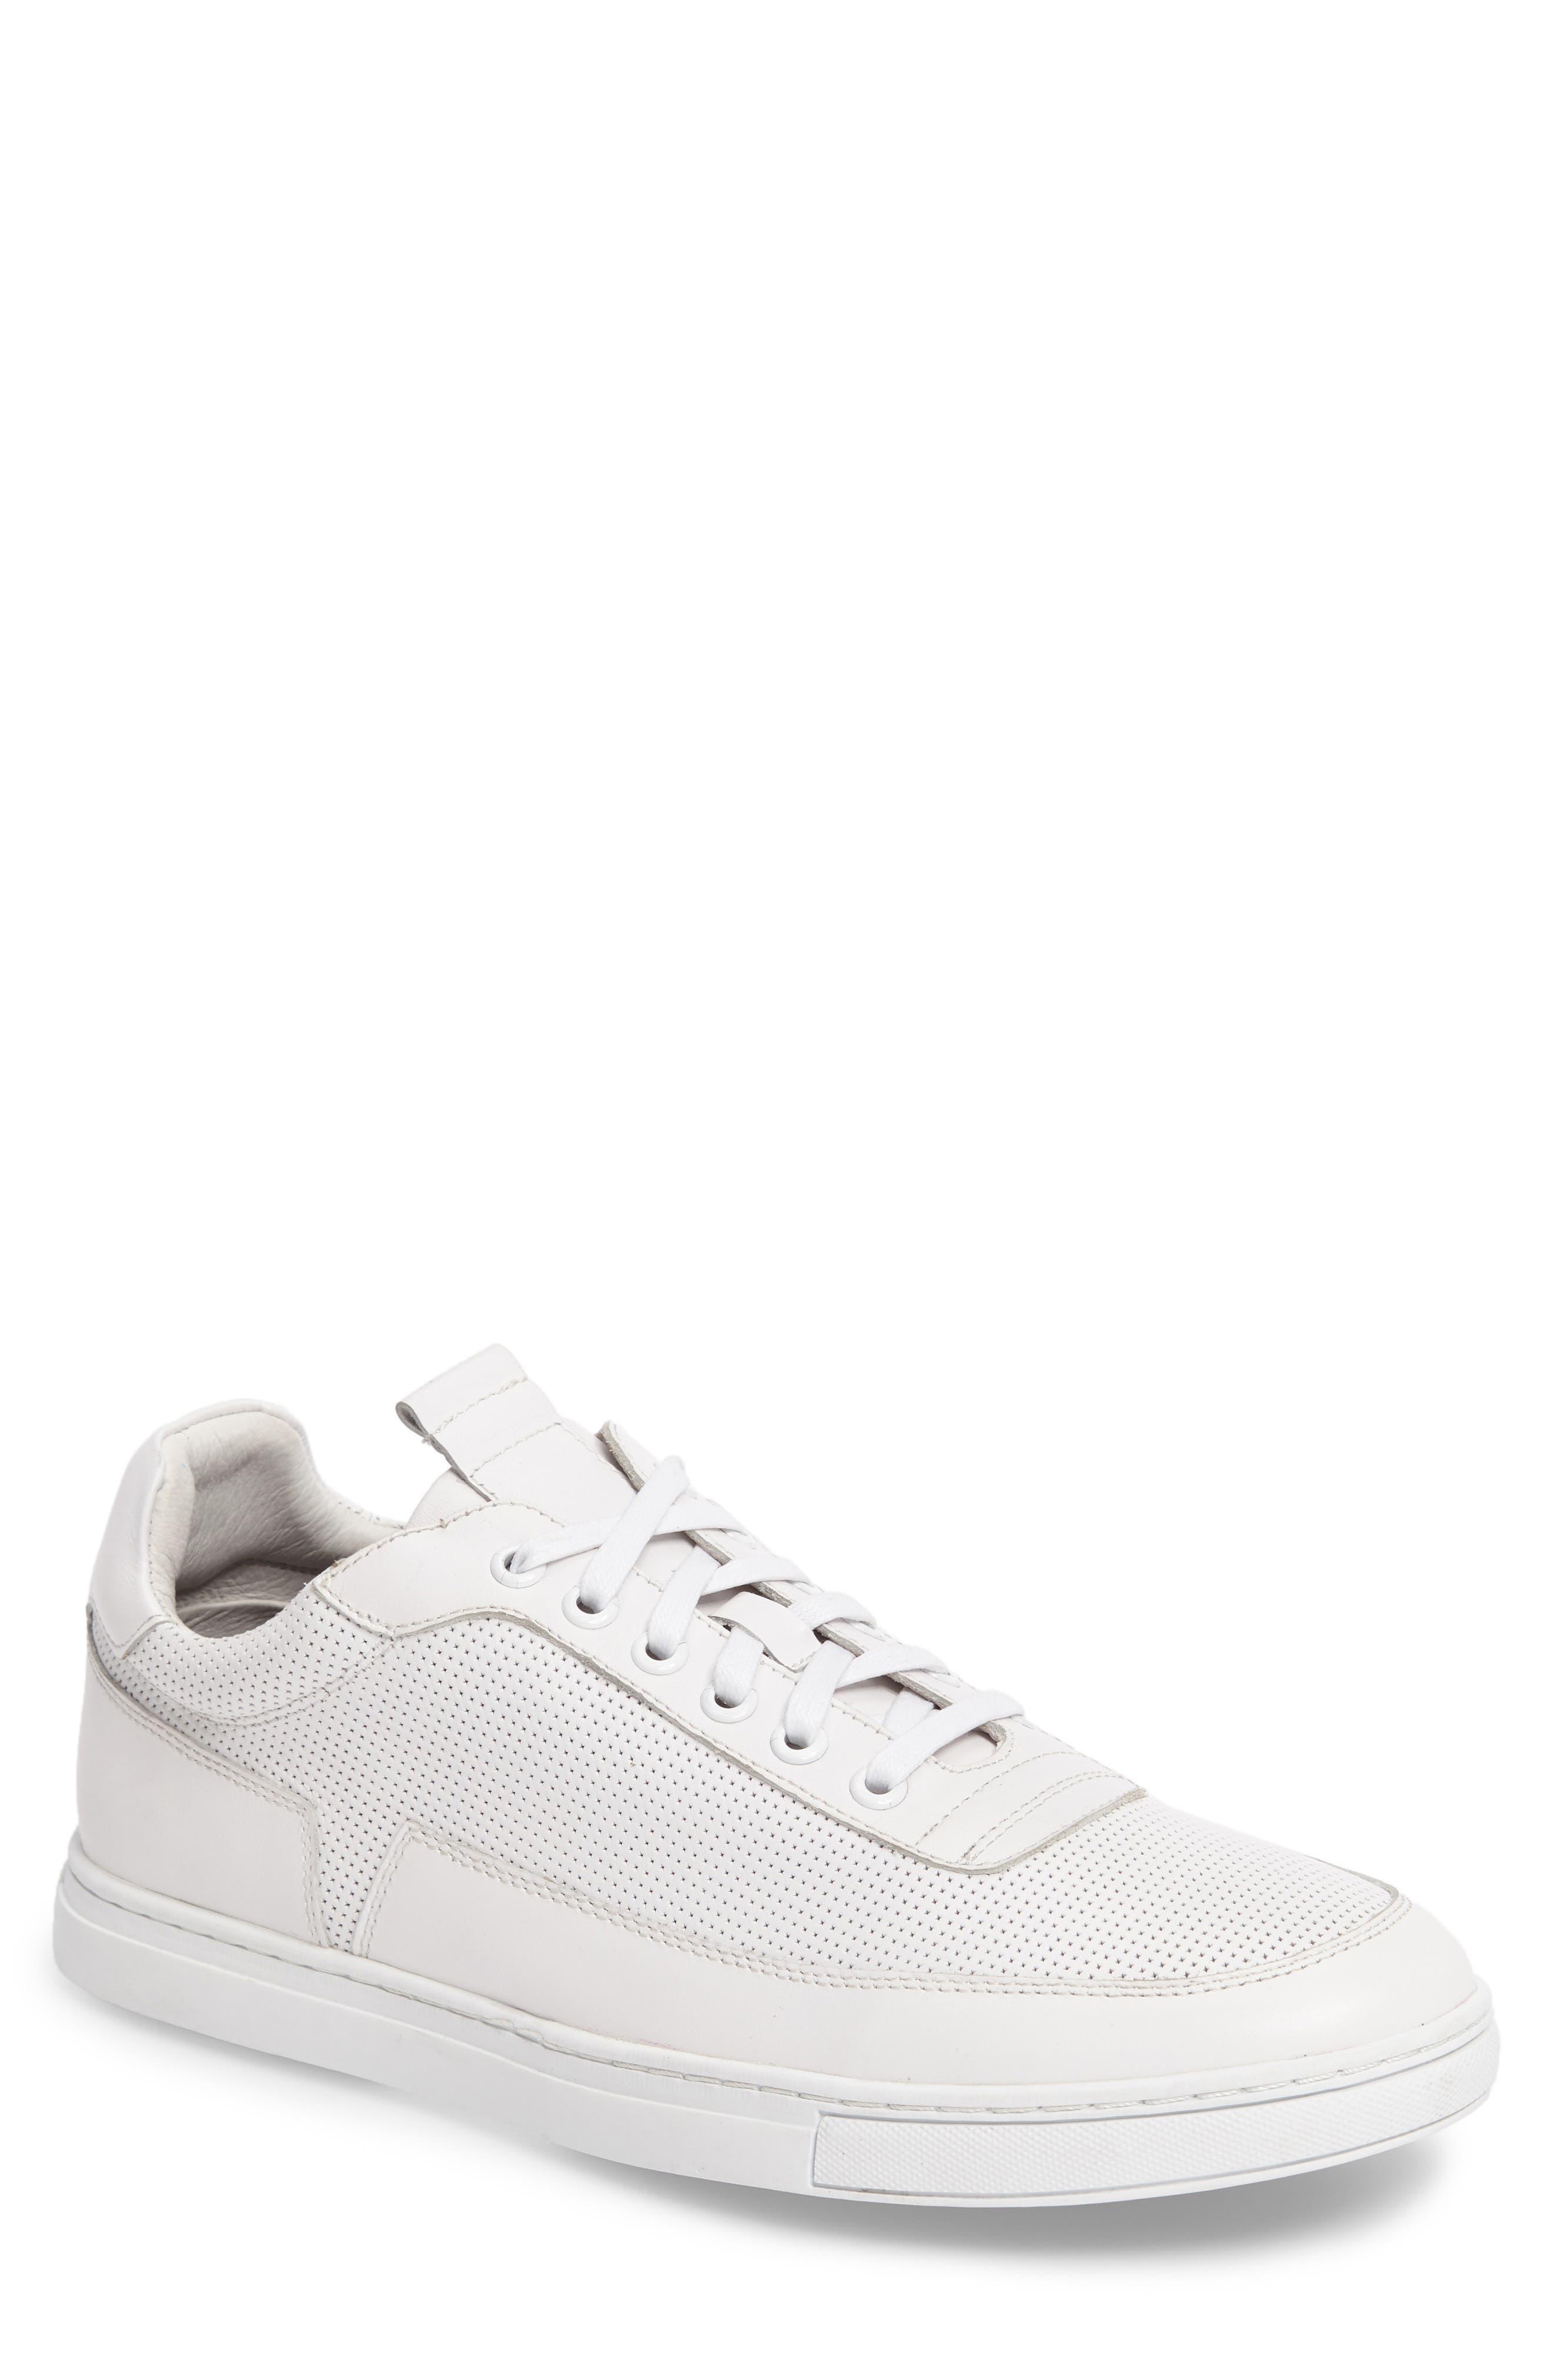 Alternate Image 1 Selected - Zanzara Harmony Sneaker (Men)